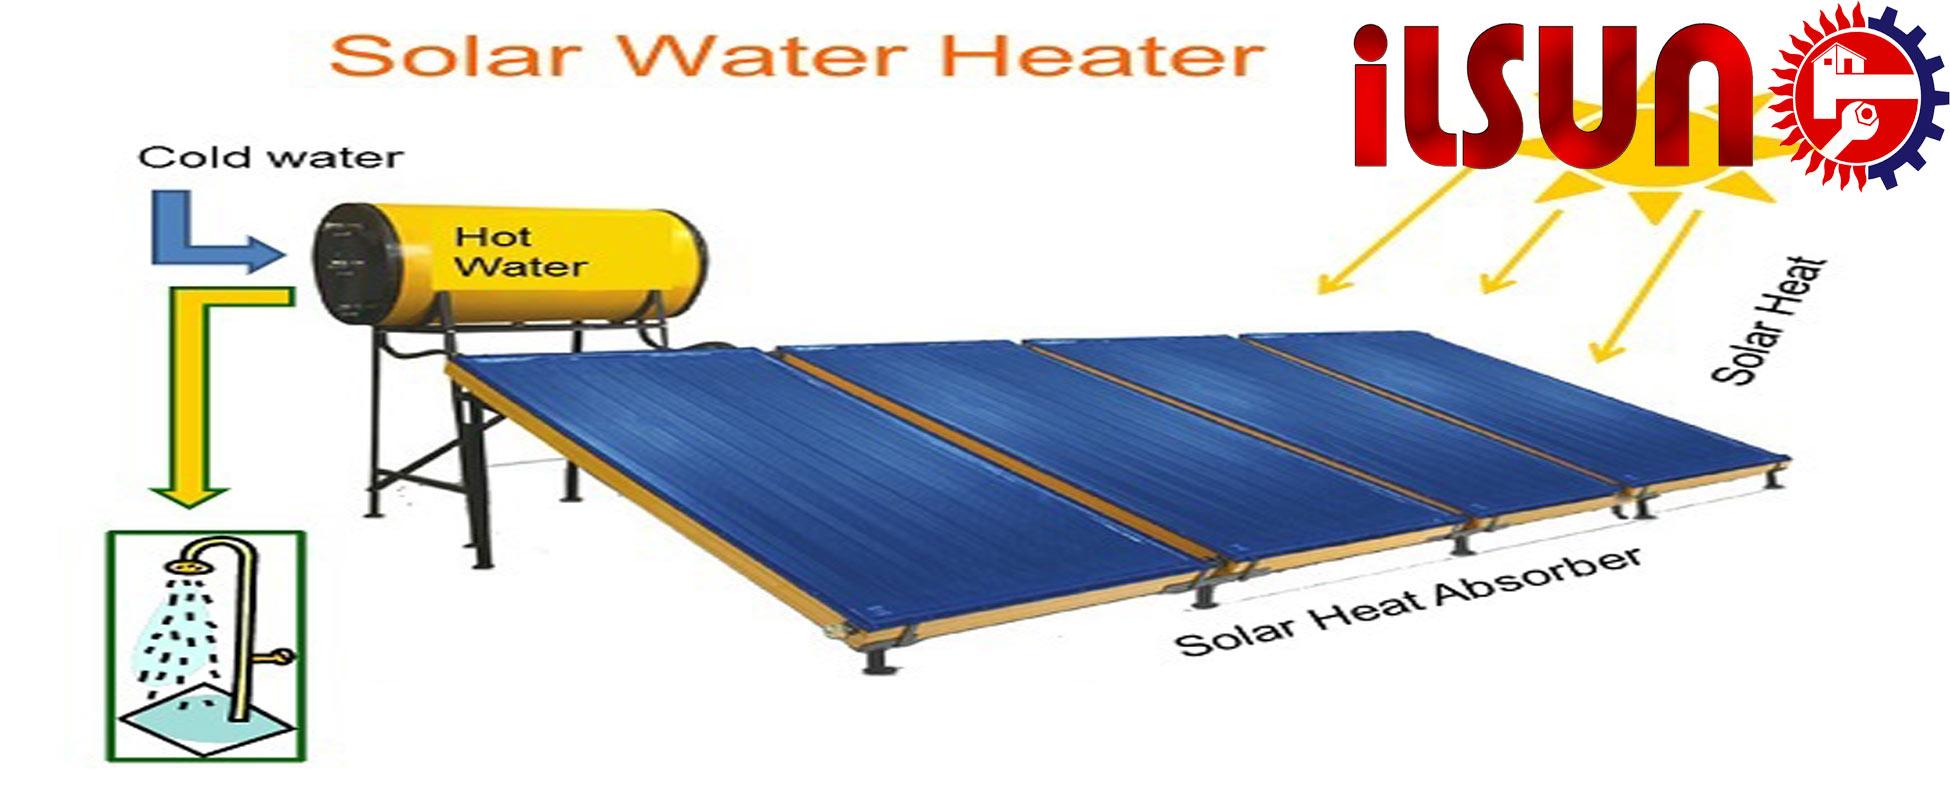 نحوه نصب آبگرمکن خورشیدی فلوتردار خرید آبگرمکن خورشیدی